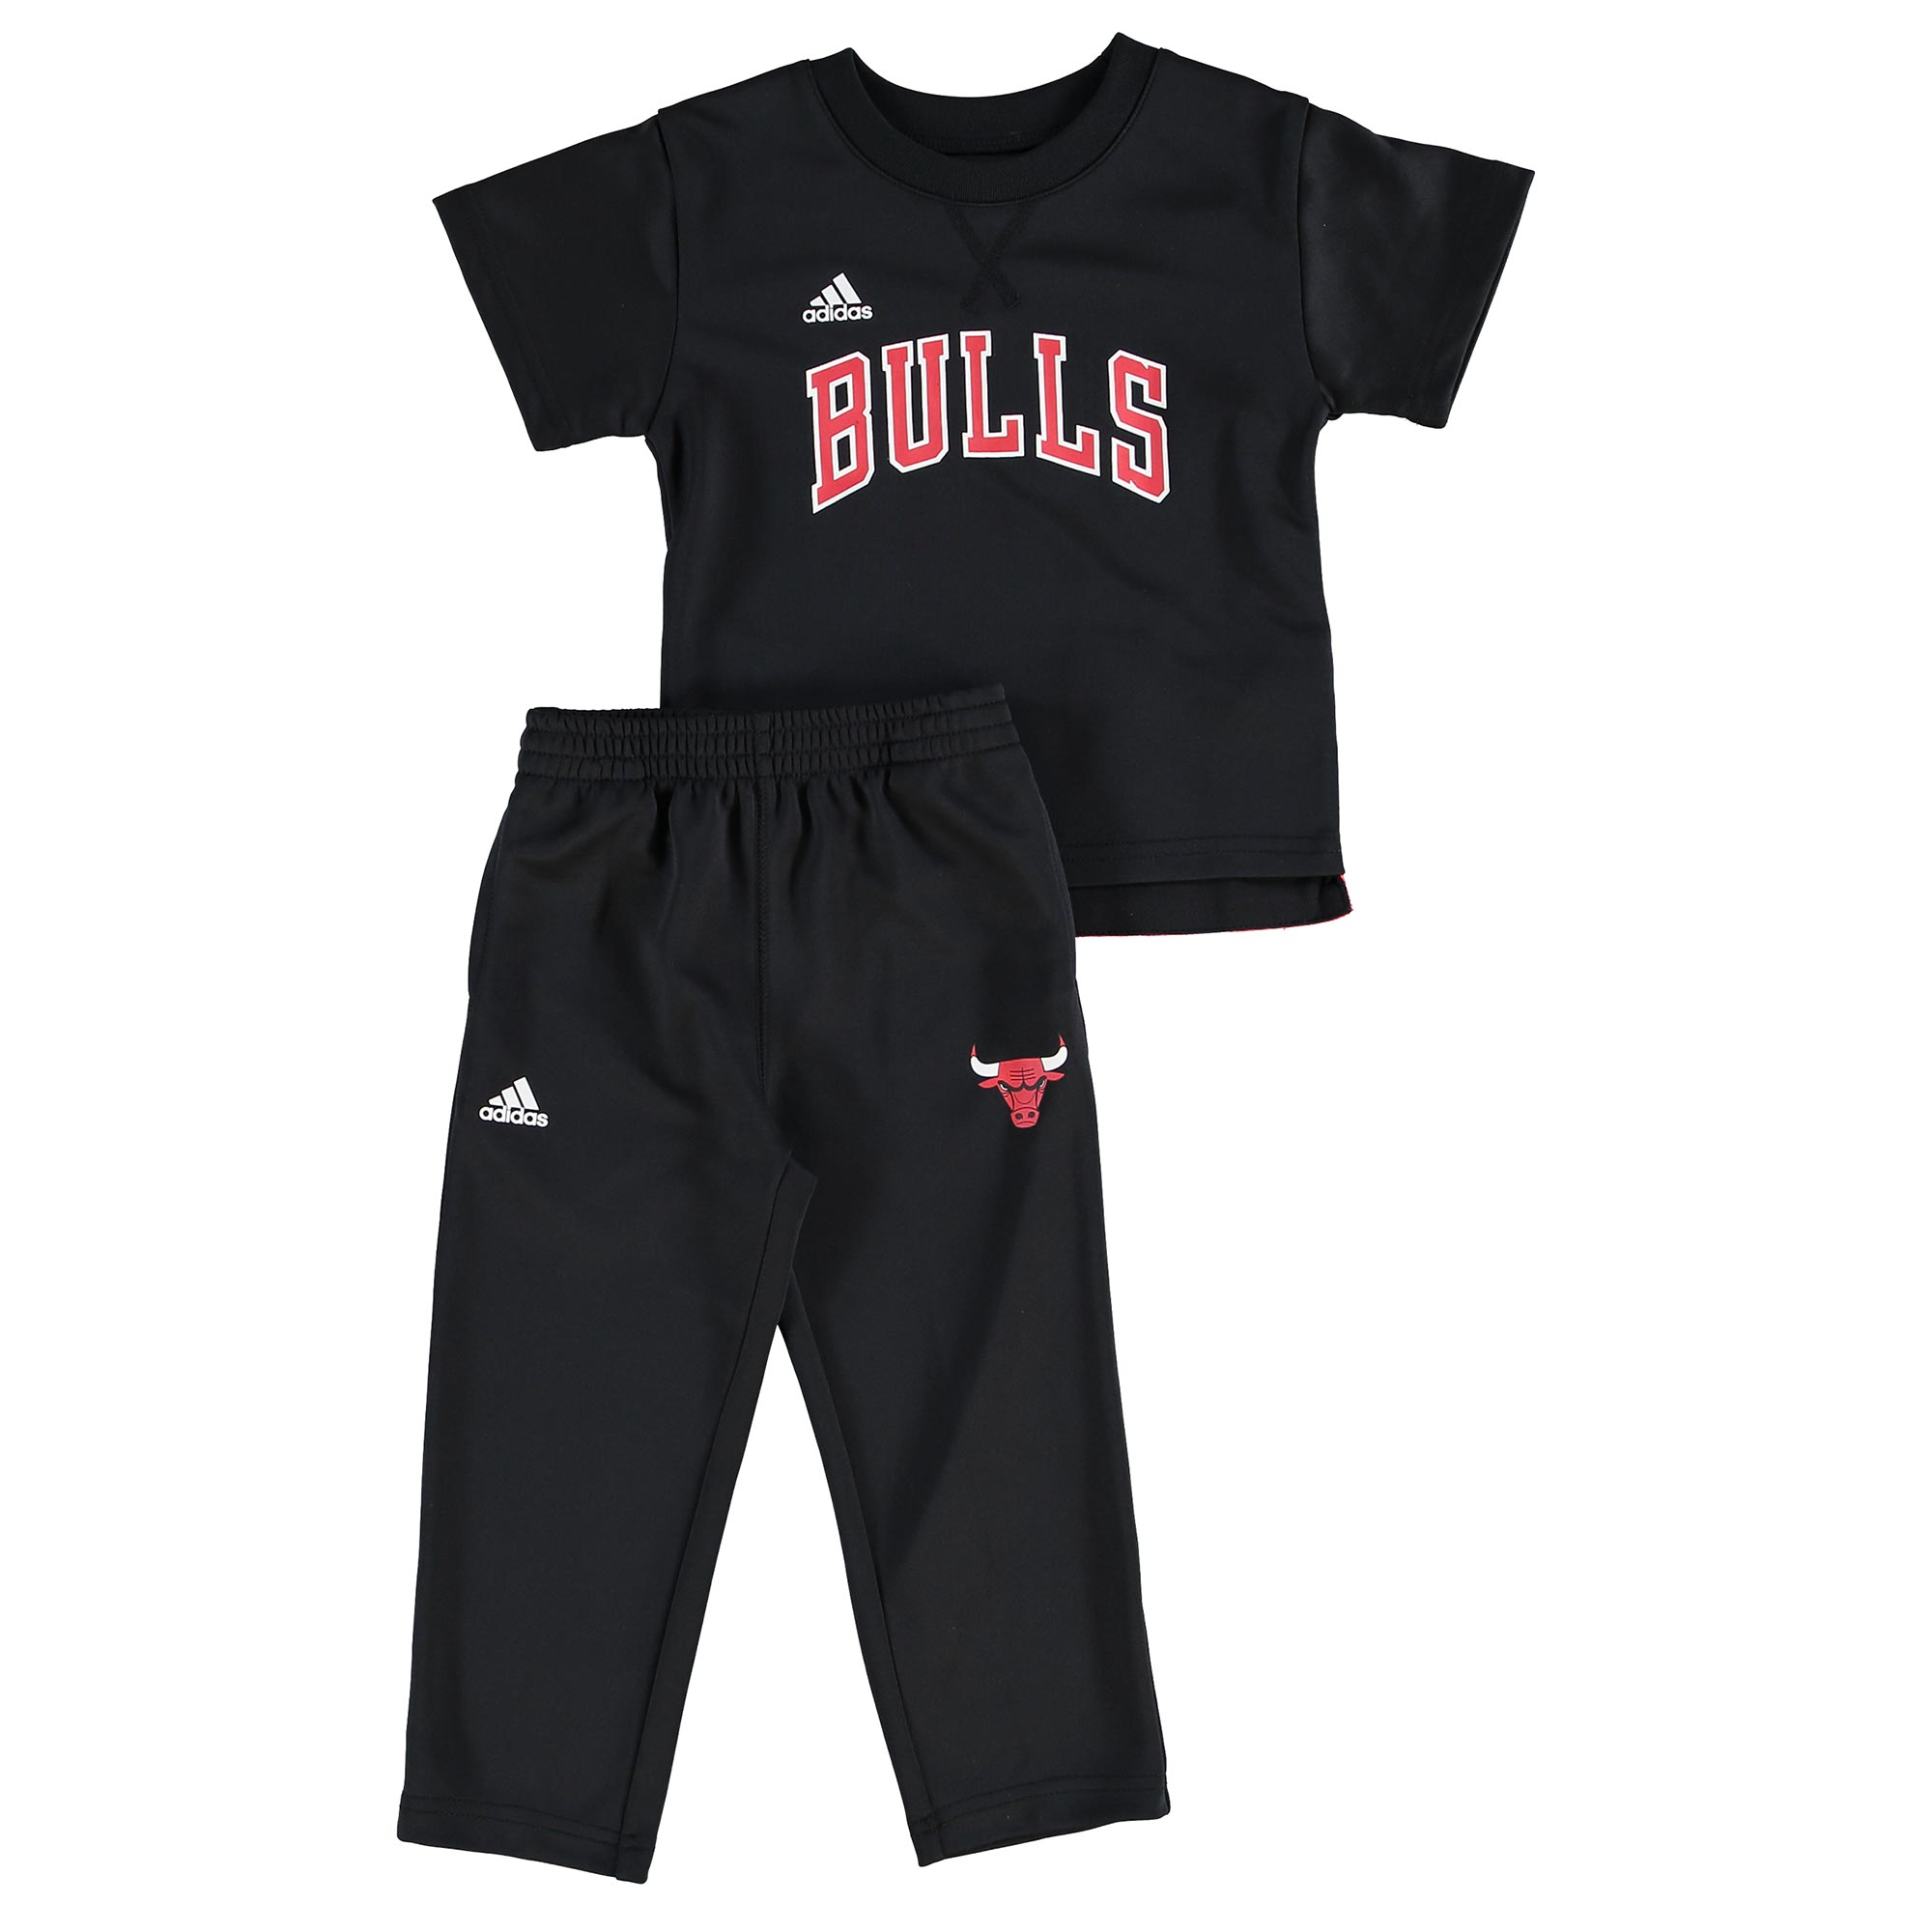 Chicago Bulls Courtside Tracksuit - Toddler